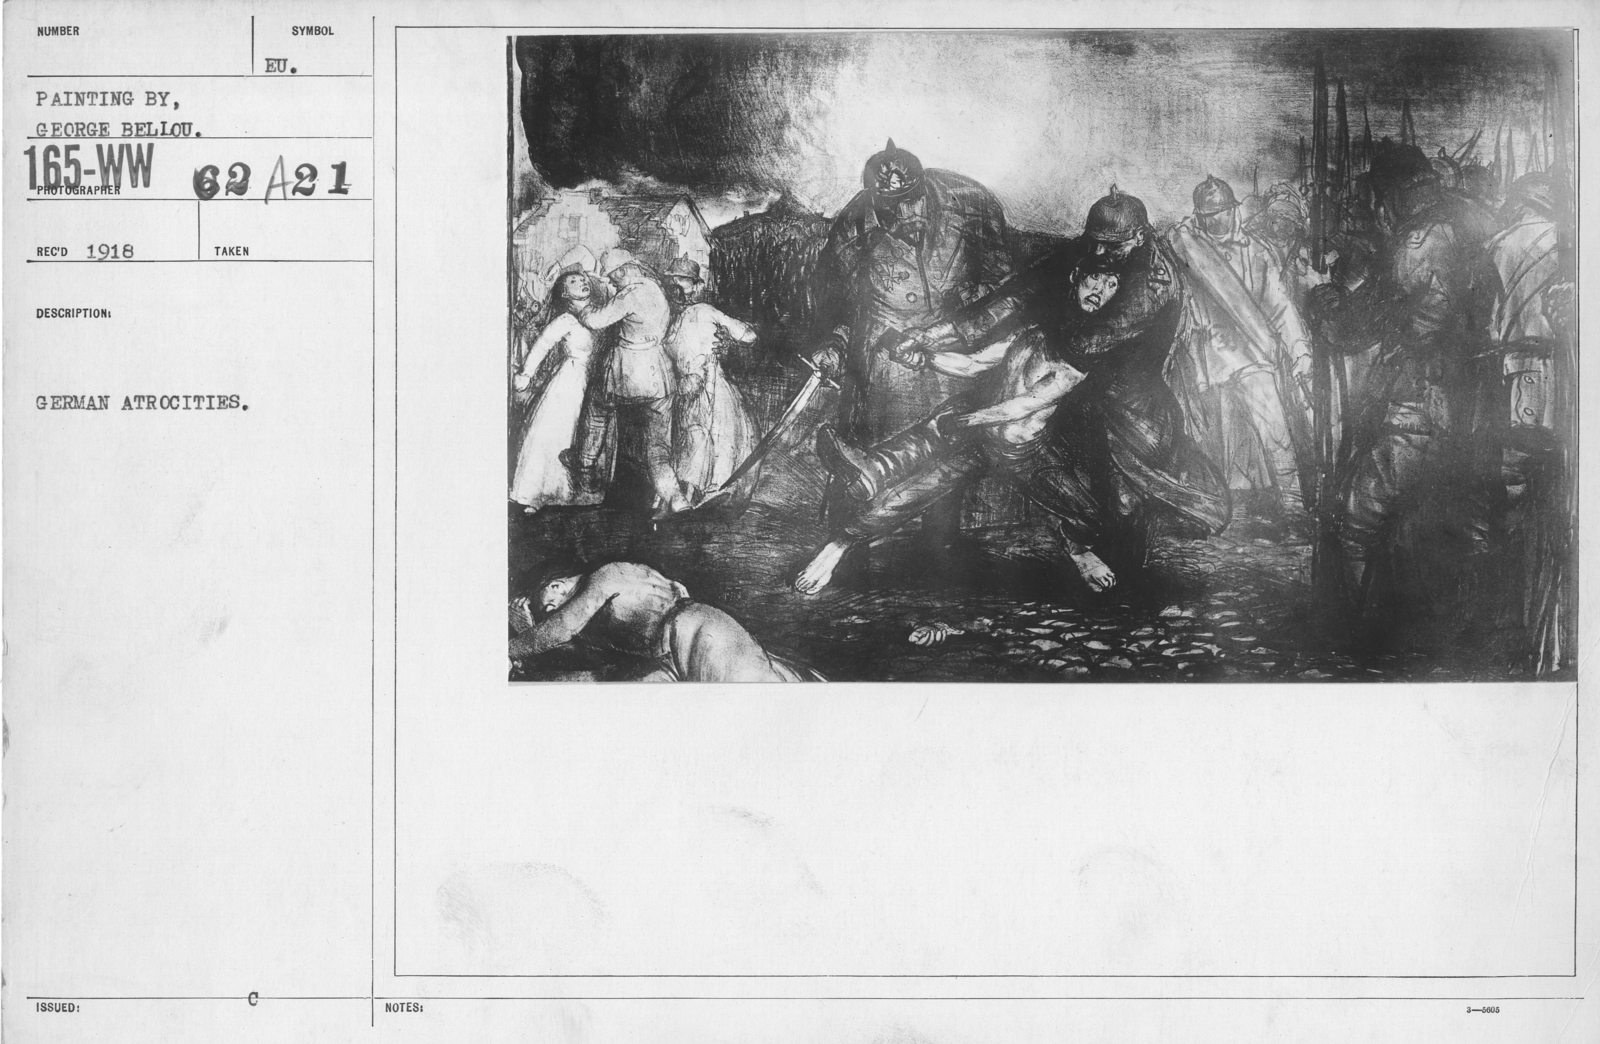 Artists - American Artworks (Wartime Cartoons) - German atrocities